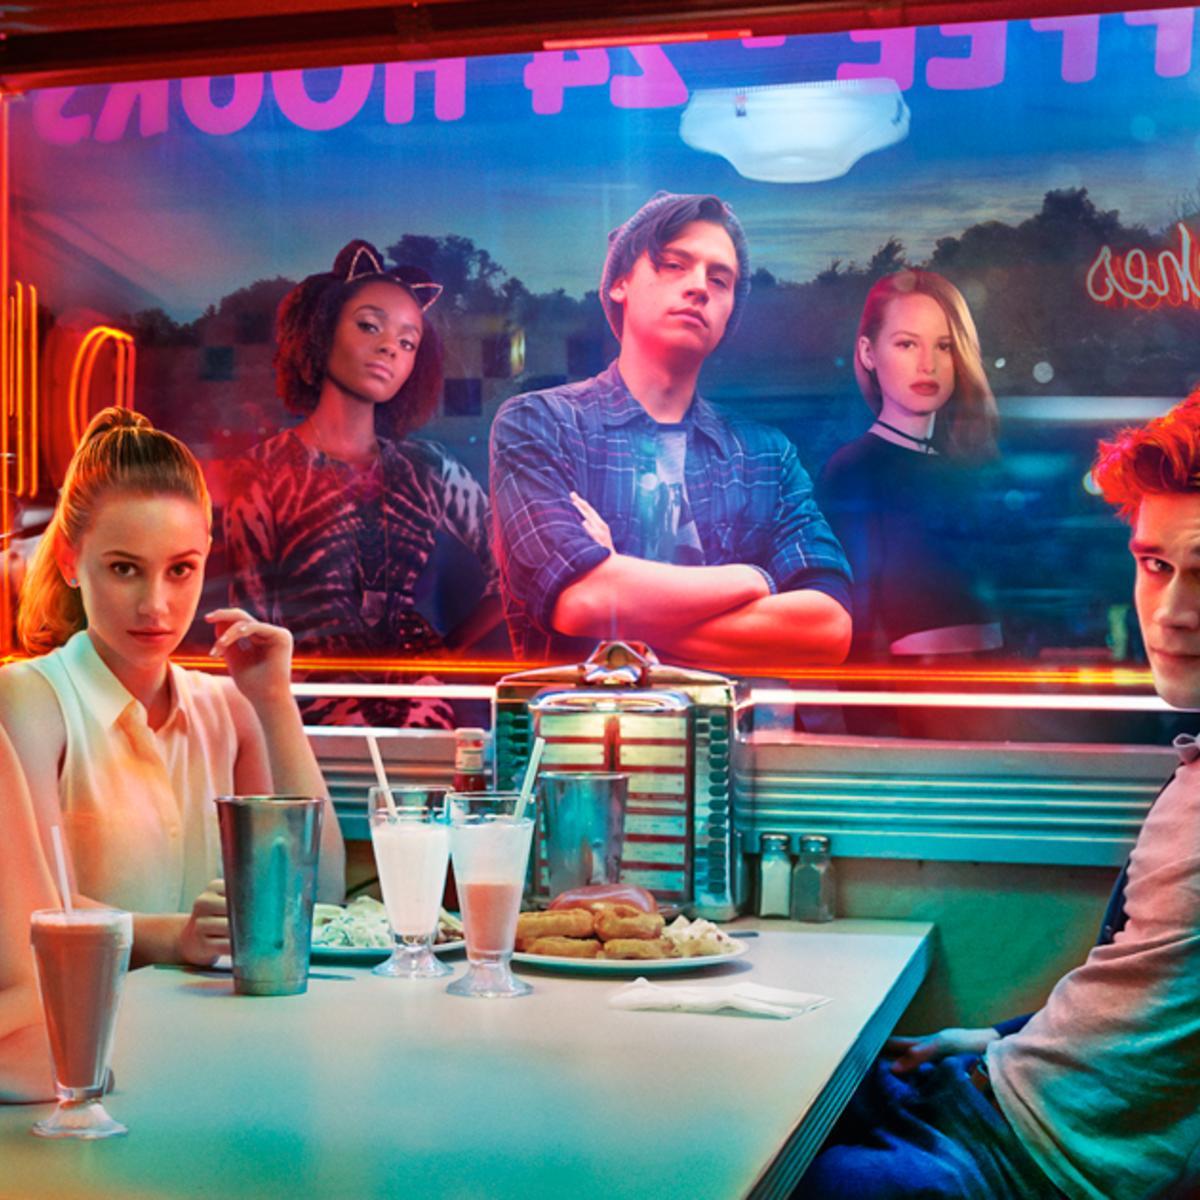 Riverdale Sdcc Season 2 Sneak Peek Shows Aftermath Of Shocking